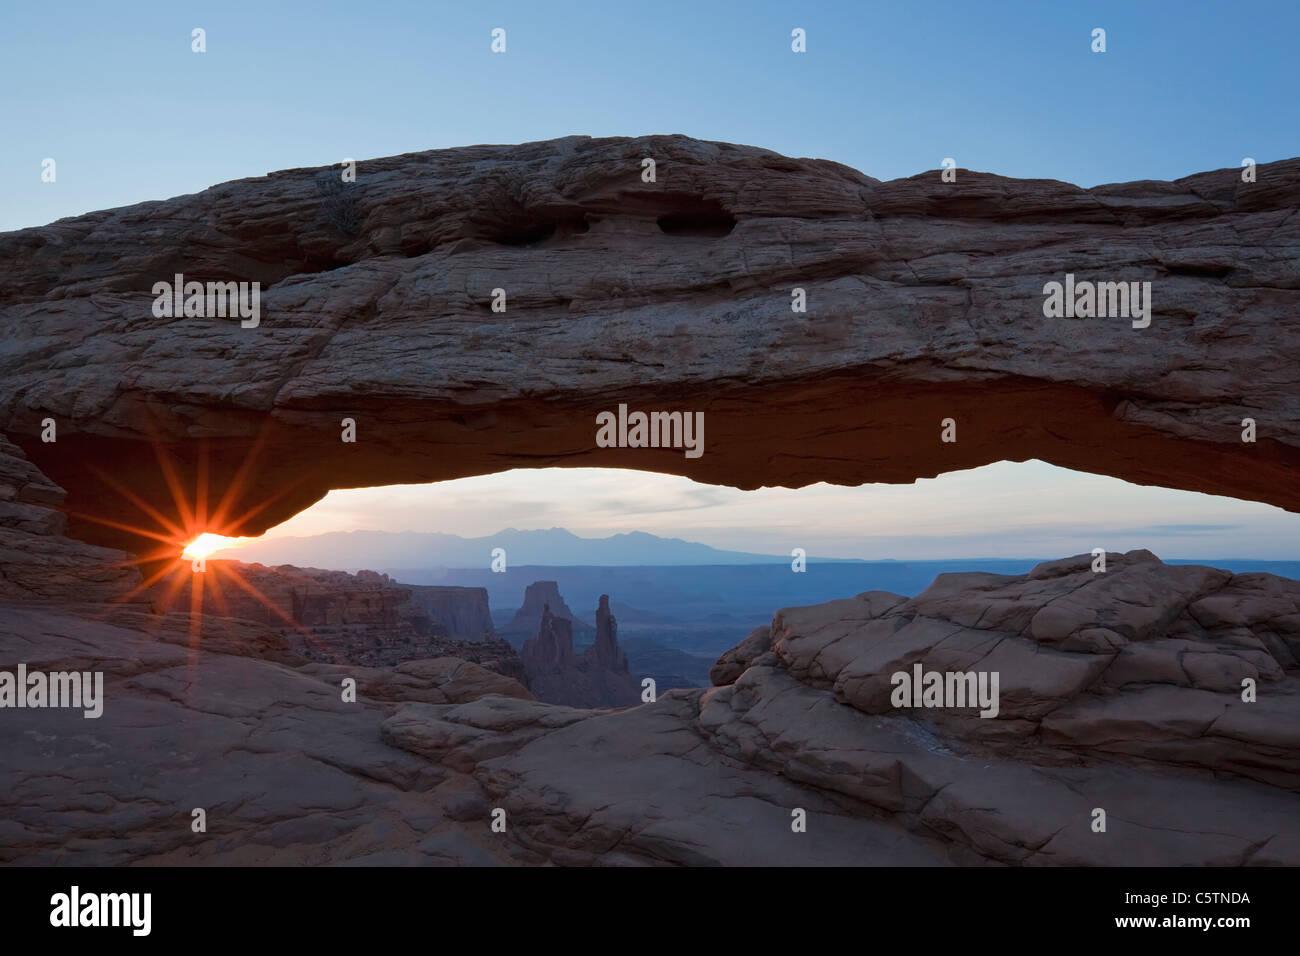 USA, Utah, Canyonlands National Park, Mesa Arch Photo Stock